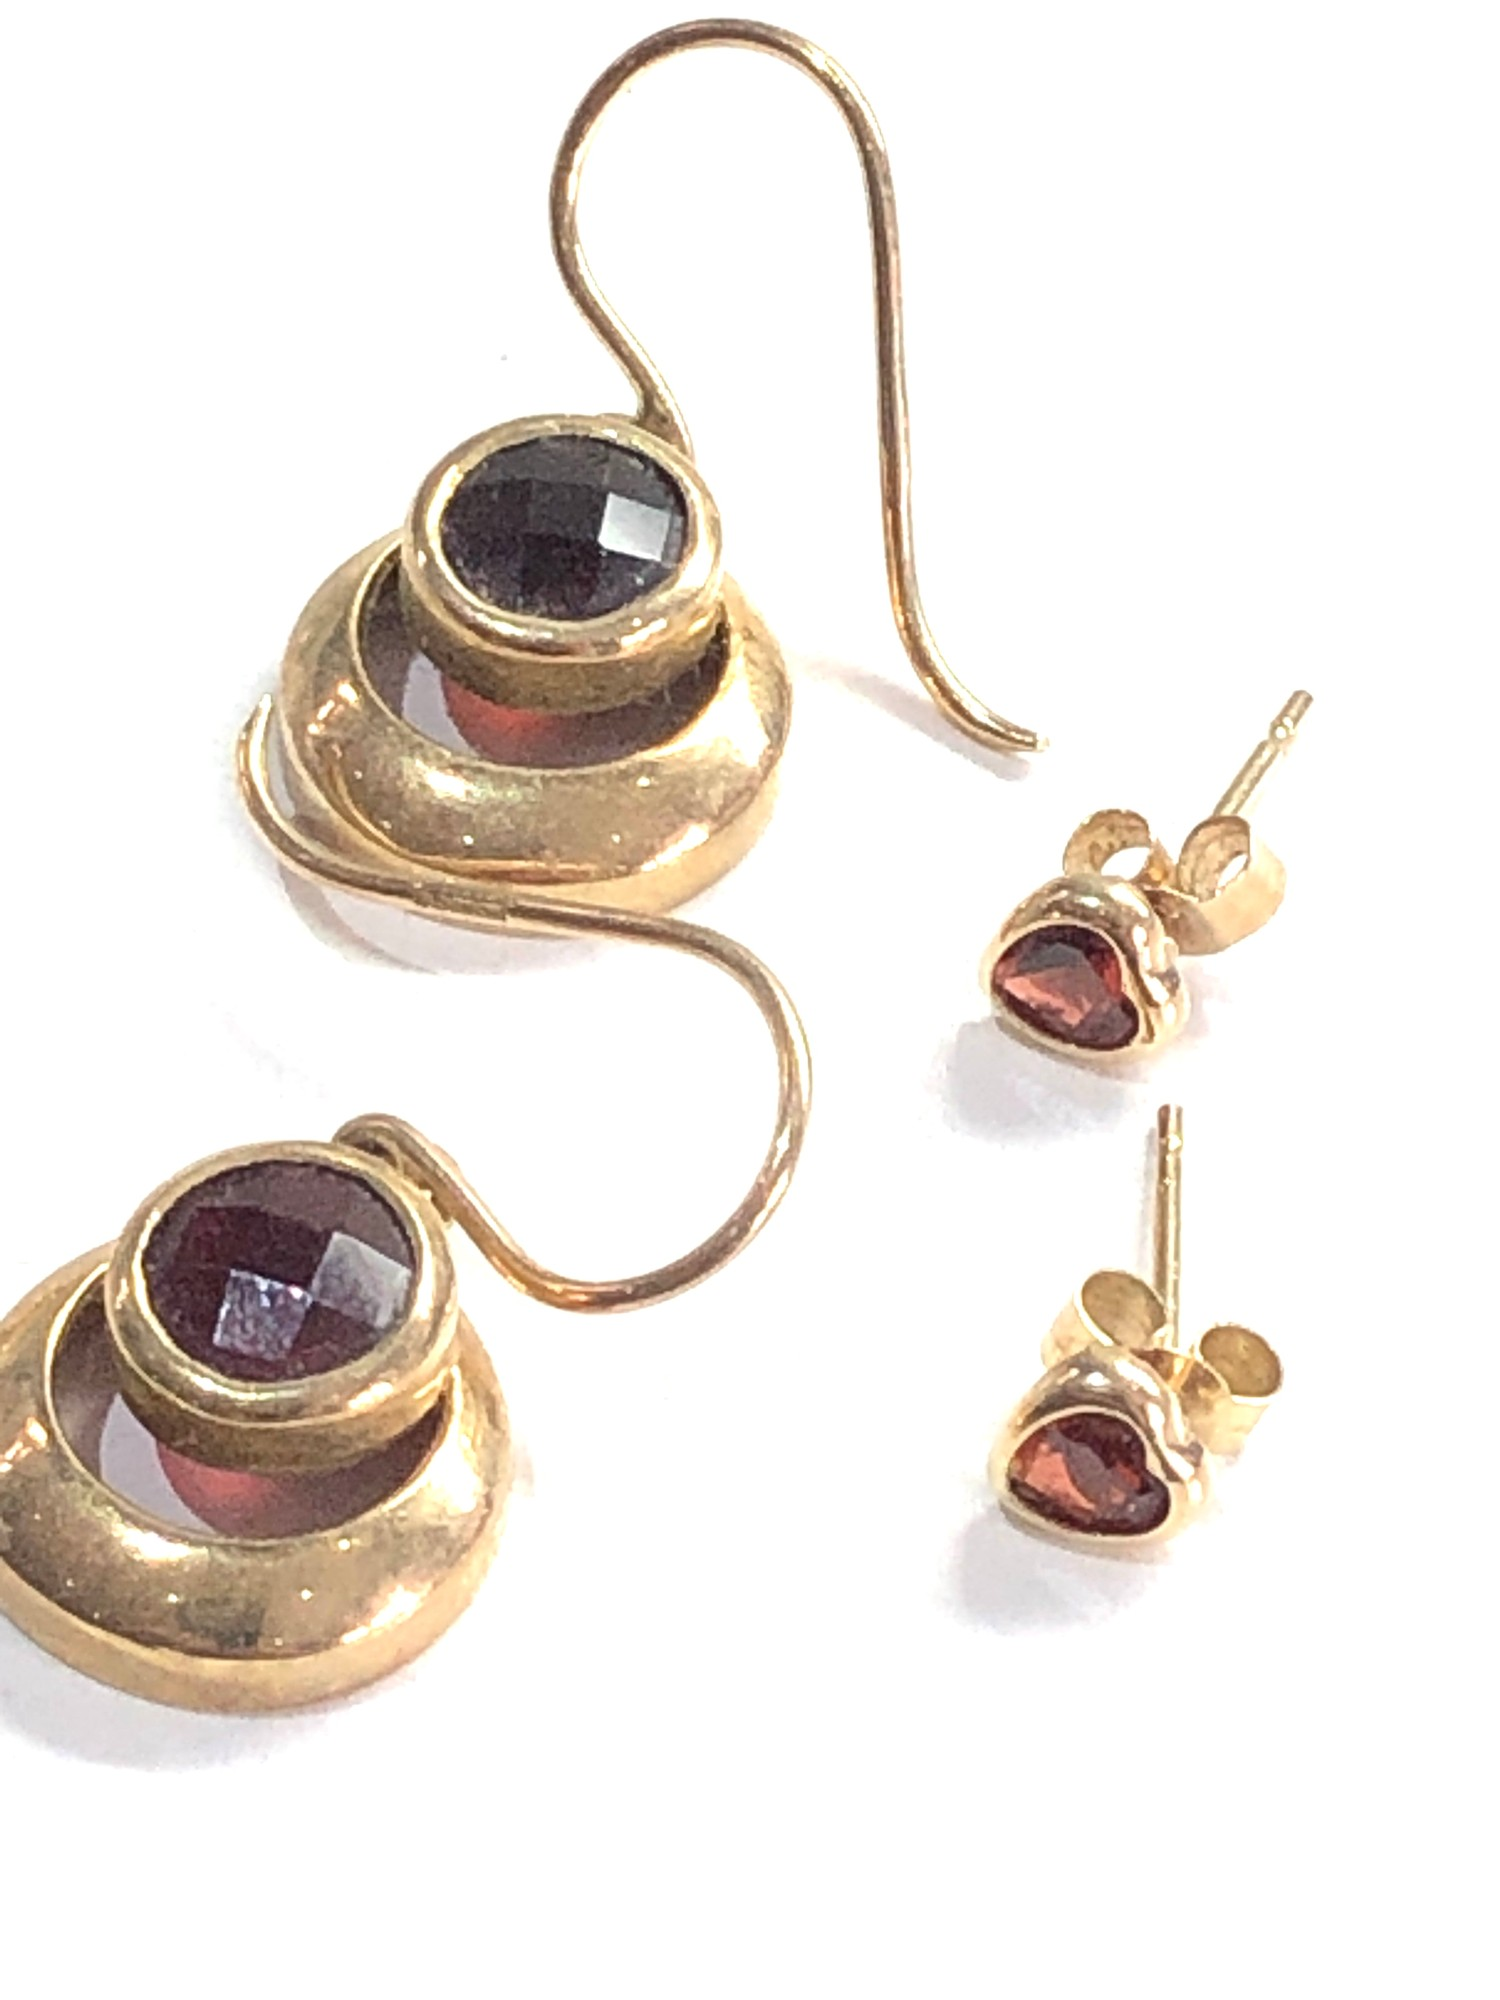 3 x 9ct garnet earrings 5g - Image 3 of 3